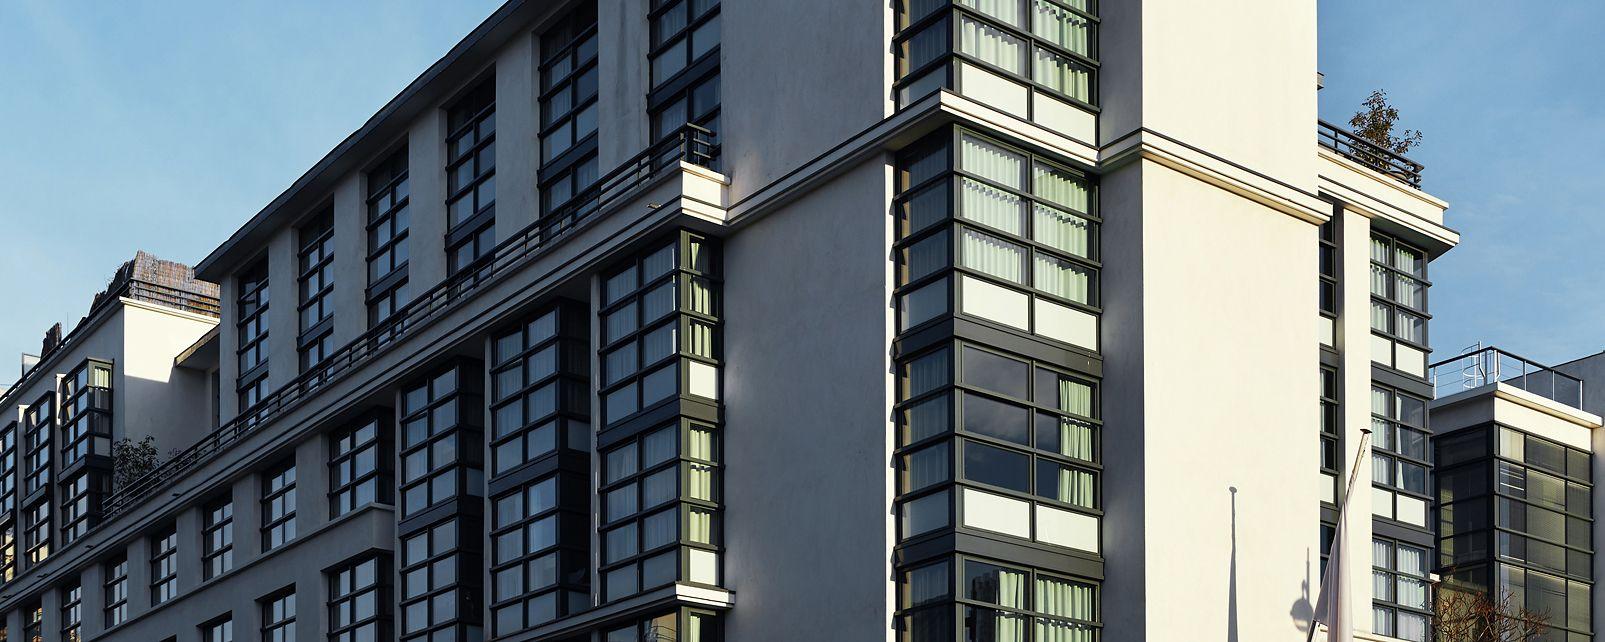 Hotel Mama Shelter Paris East